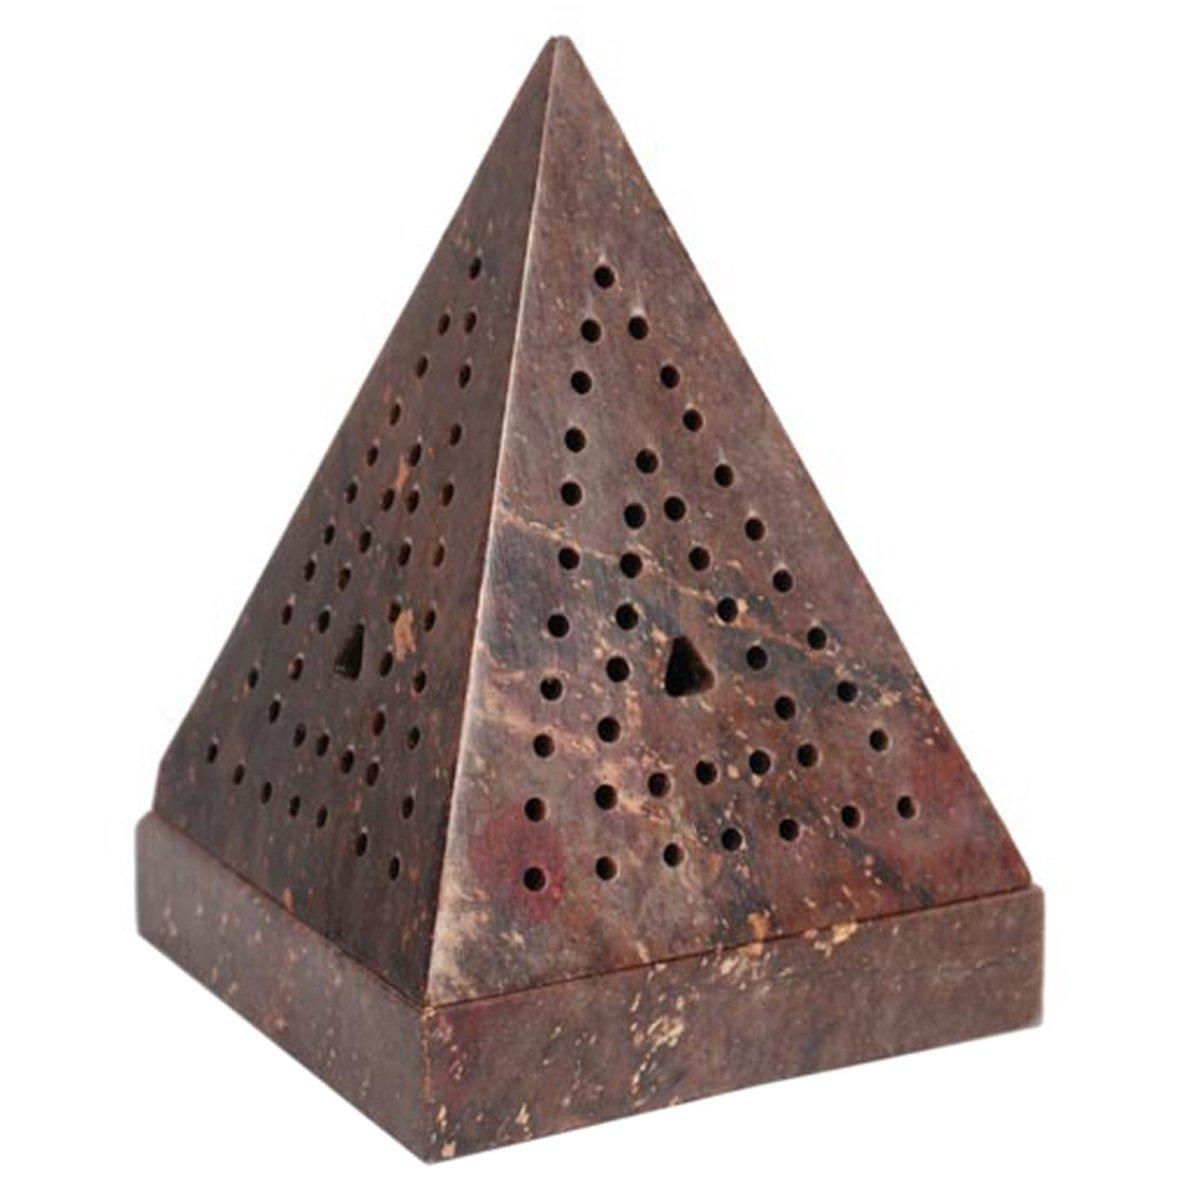 Aromatherapy Hosley 5 High Large Soapstone Triangle Pyramid, Incense Cone Holder. Ideal Gift for Aromatherapy, Zen, Spa, Vastu, Reiki Chakra Settings. O3 HG Global